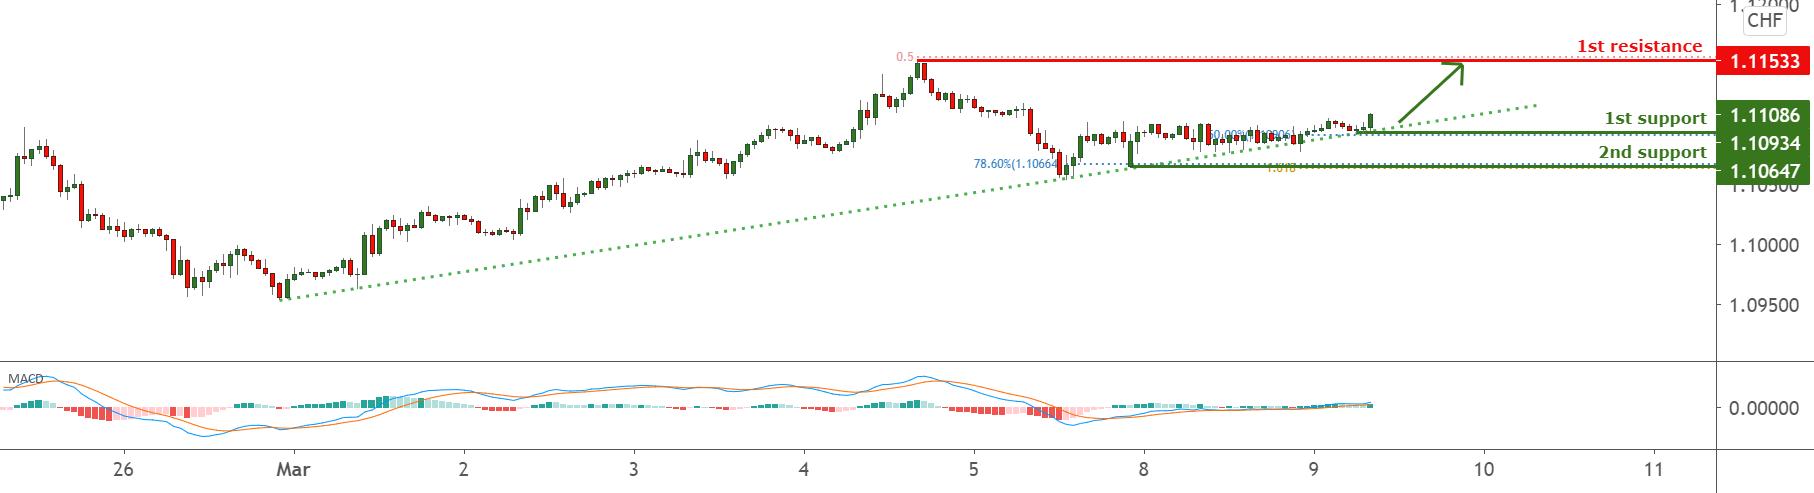 EURCHF facing bullish pressure for FX:EURCHF by FXCM